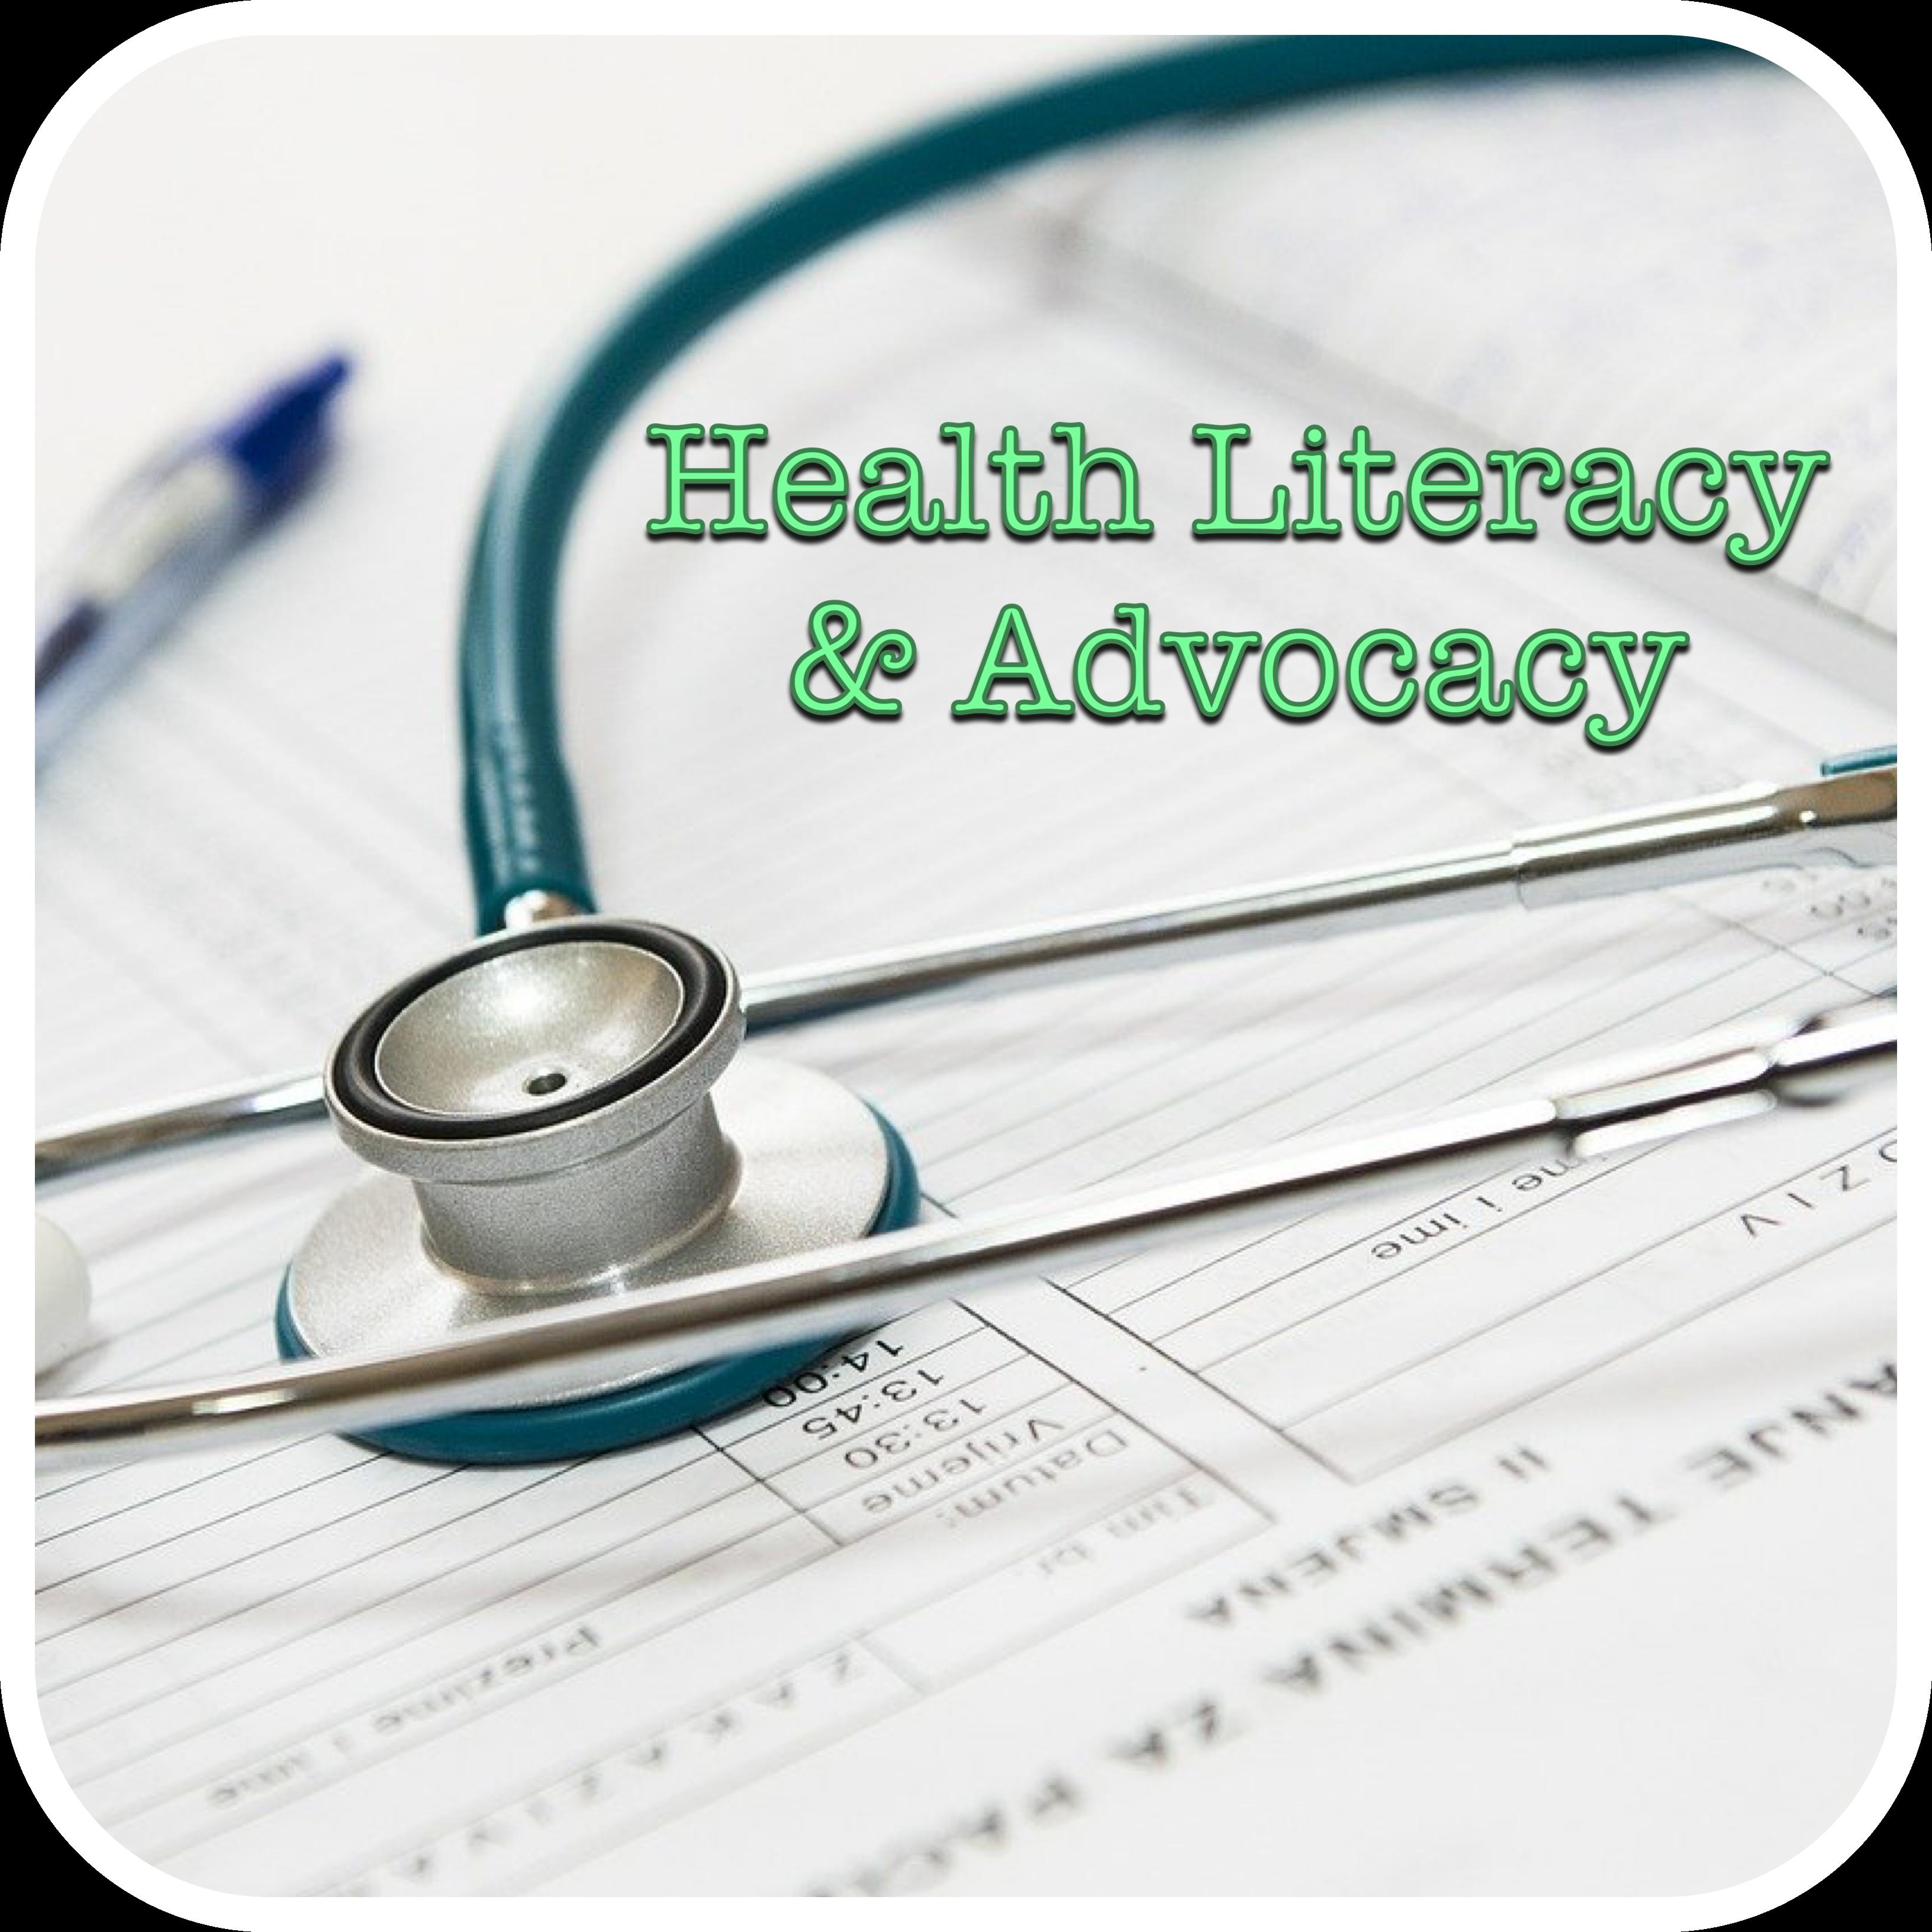 Health Literacy and Advocacy Logo (Stethoscope)